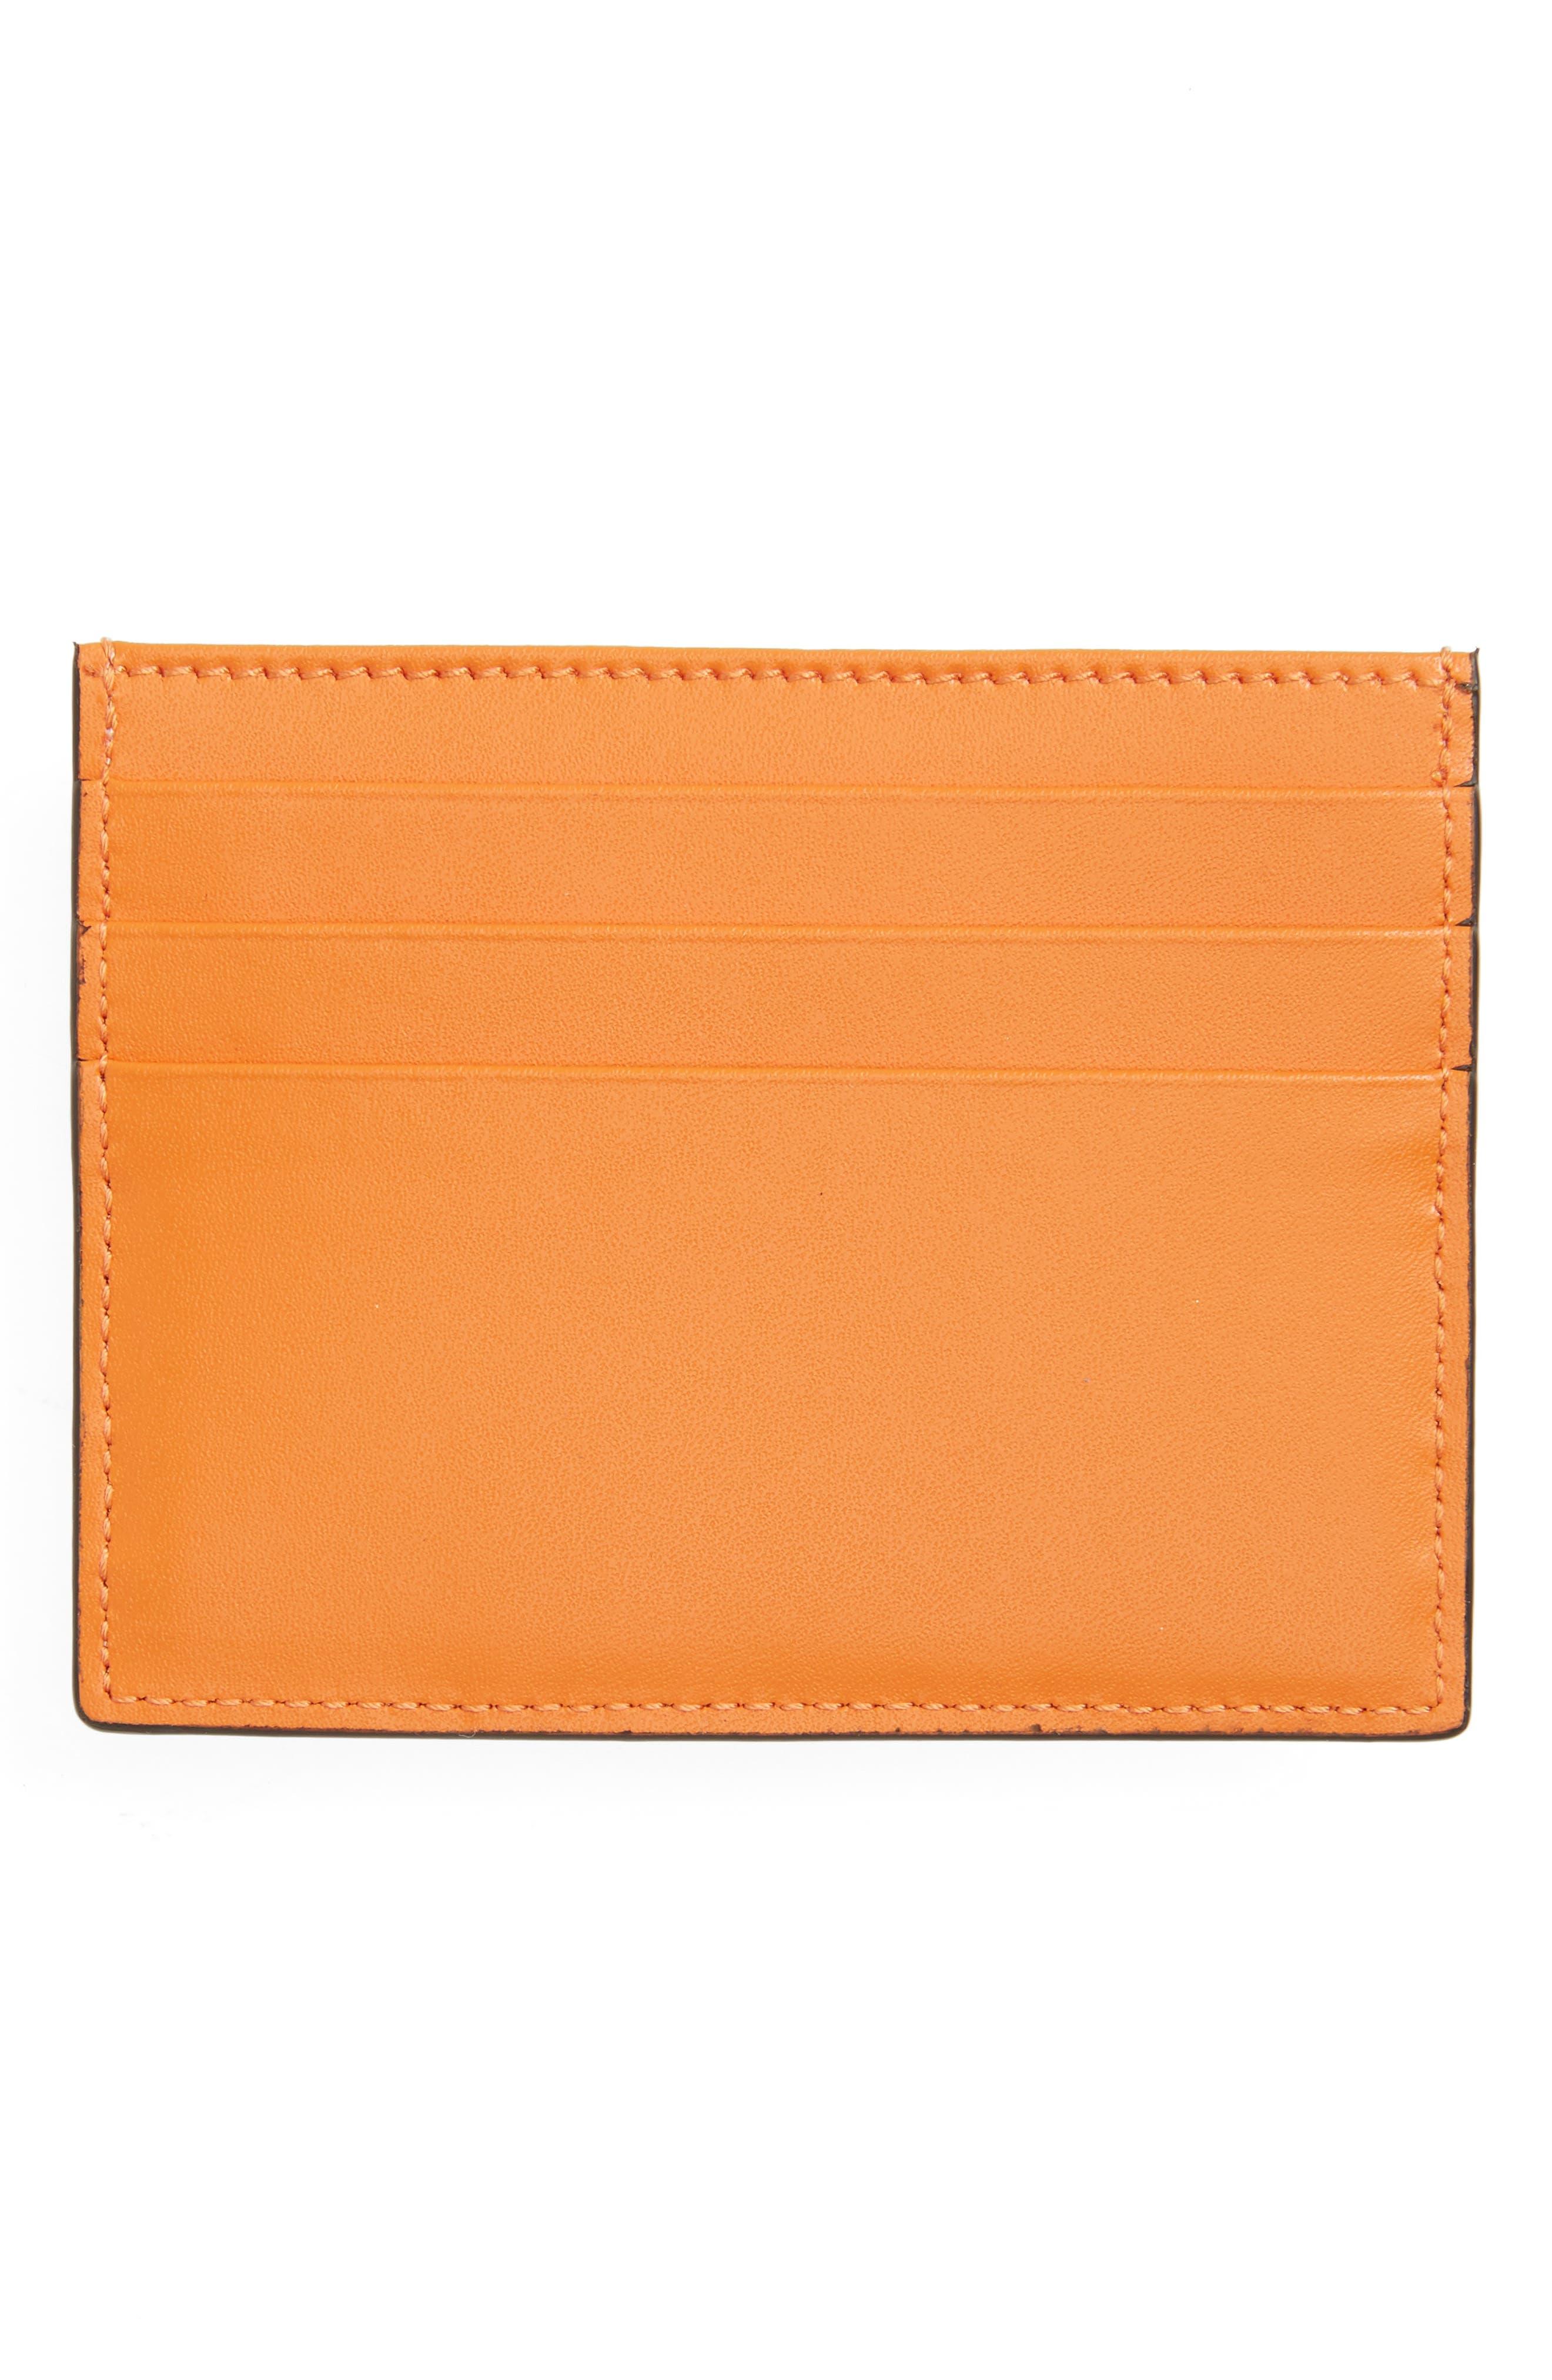 Rainbow Stud Leather Card Case,                             Alternate thumbnail 2, color,                             250